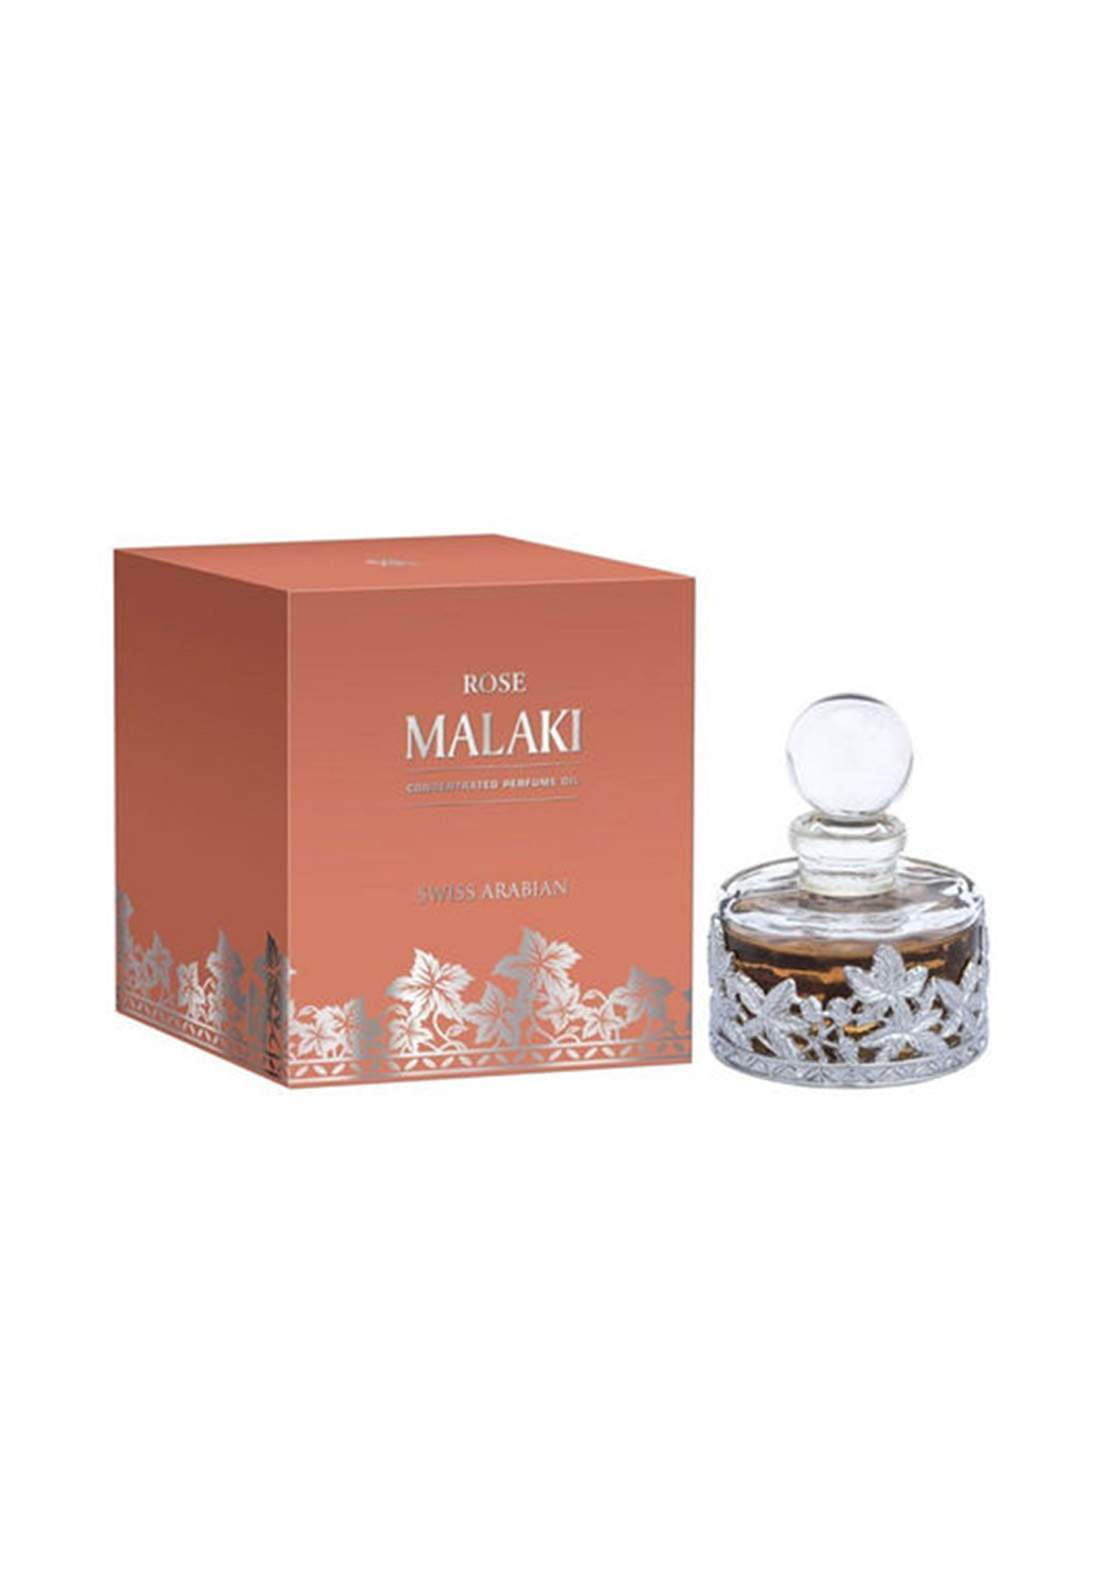 Swiss Arabian 207 Rose Malaki Concentrated Perfume Oil  Unisex- 30 ml  عطر زيتي  لكلا الجنسين